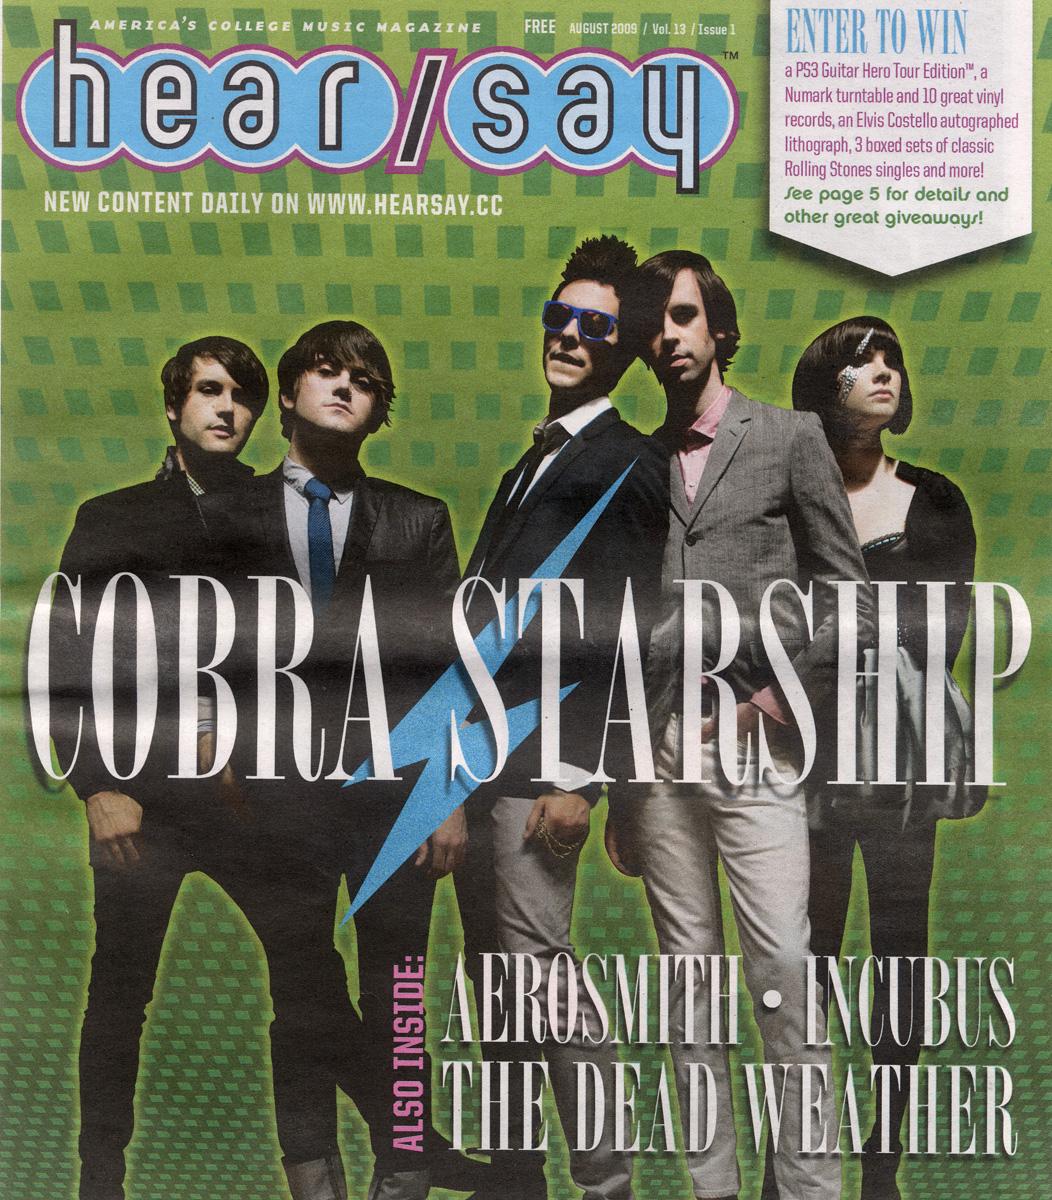 Cobra Starship - Hear Say - August 2009 - Cover.jpg